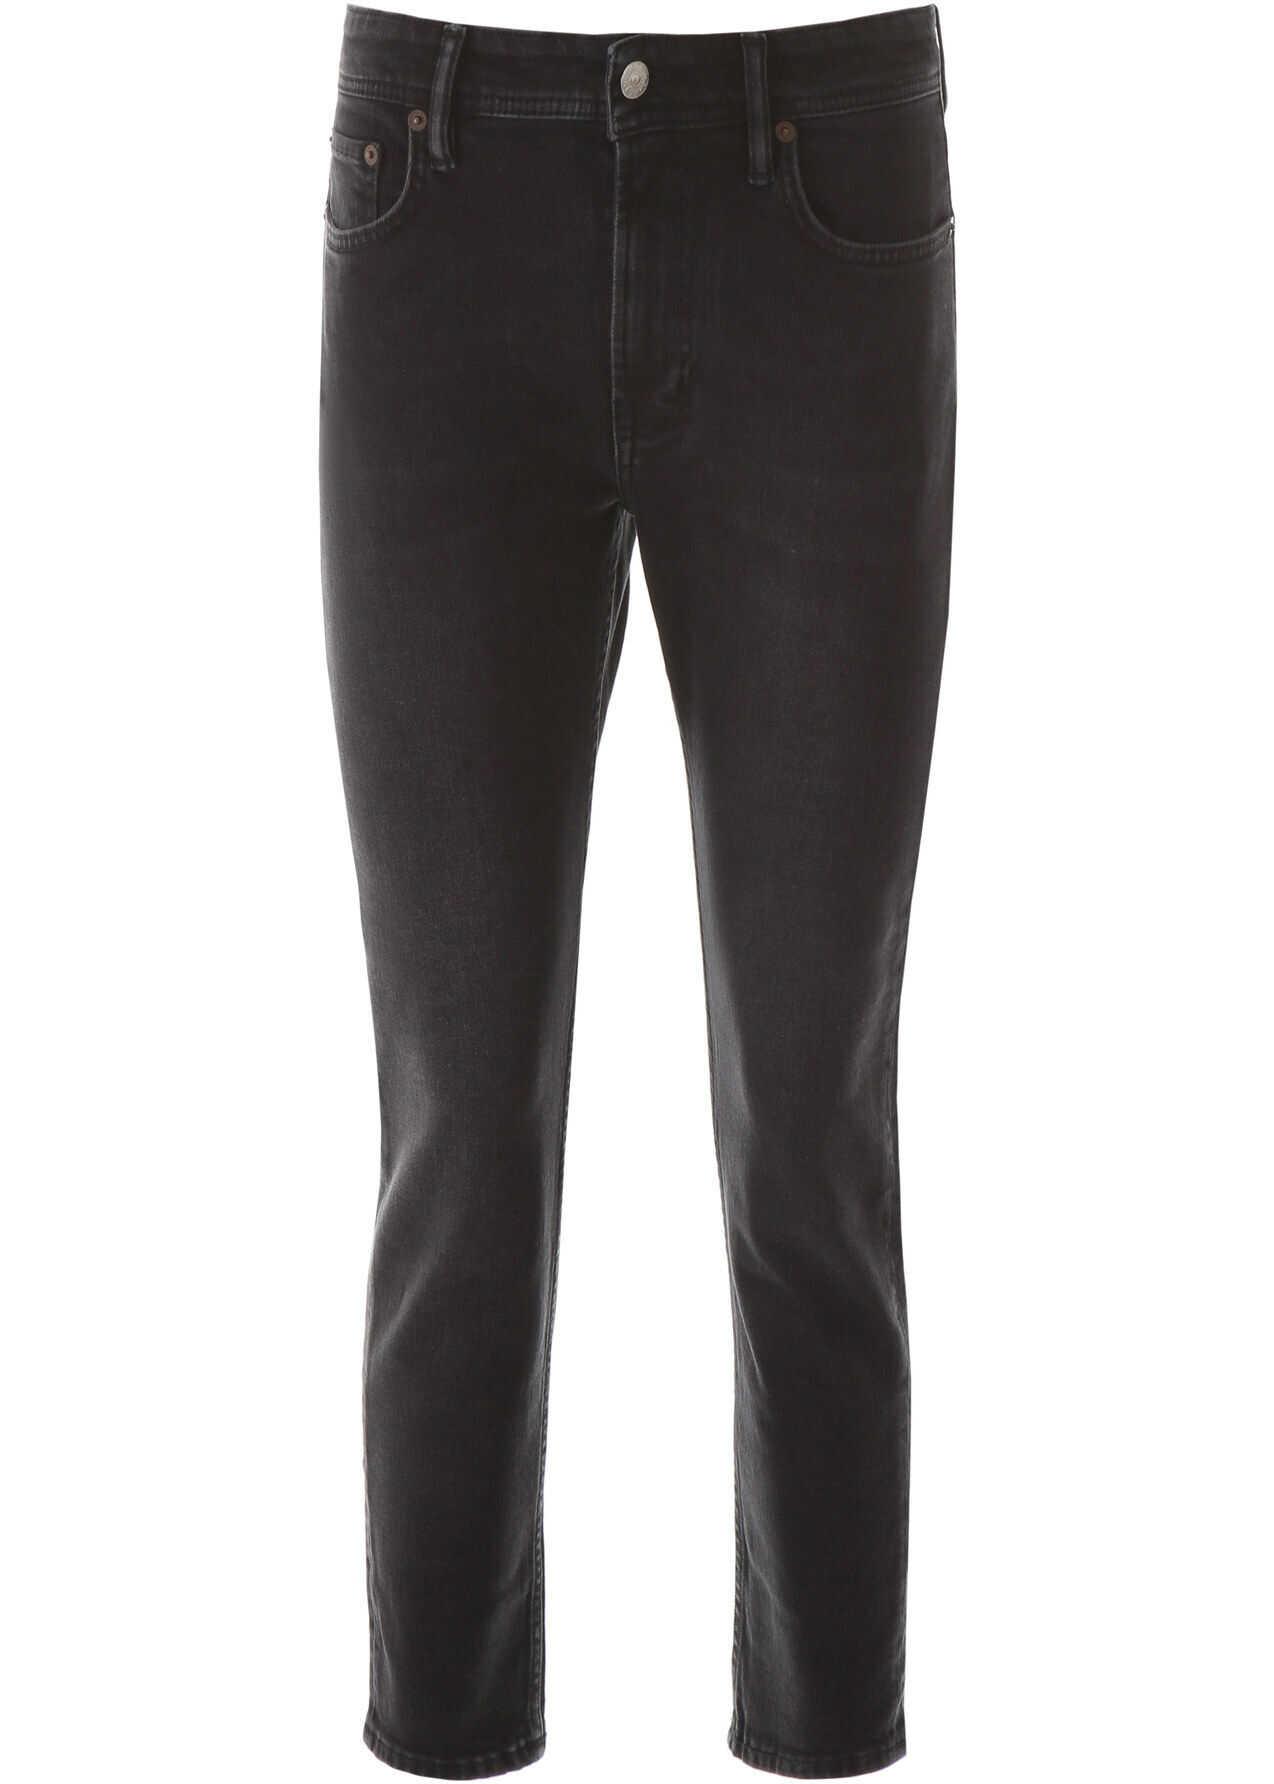 Acne Studios Melk Jeans USED BLACK